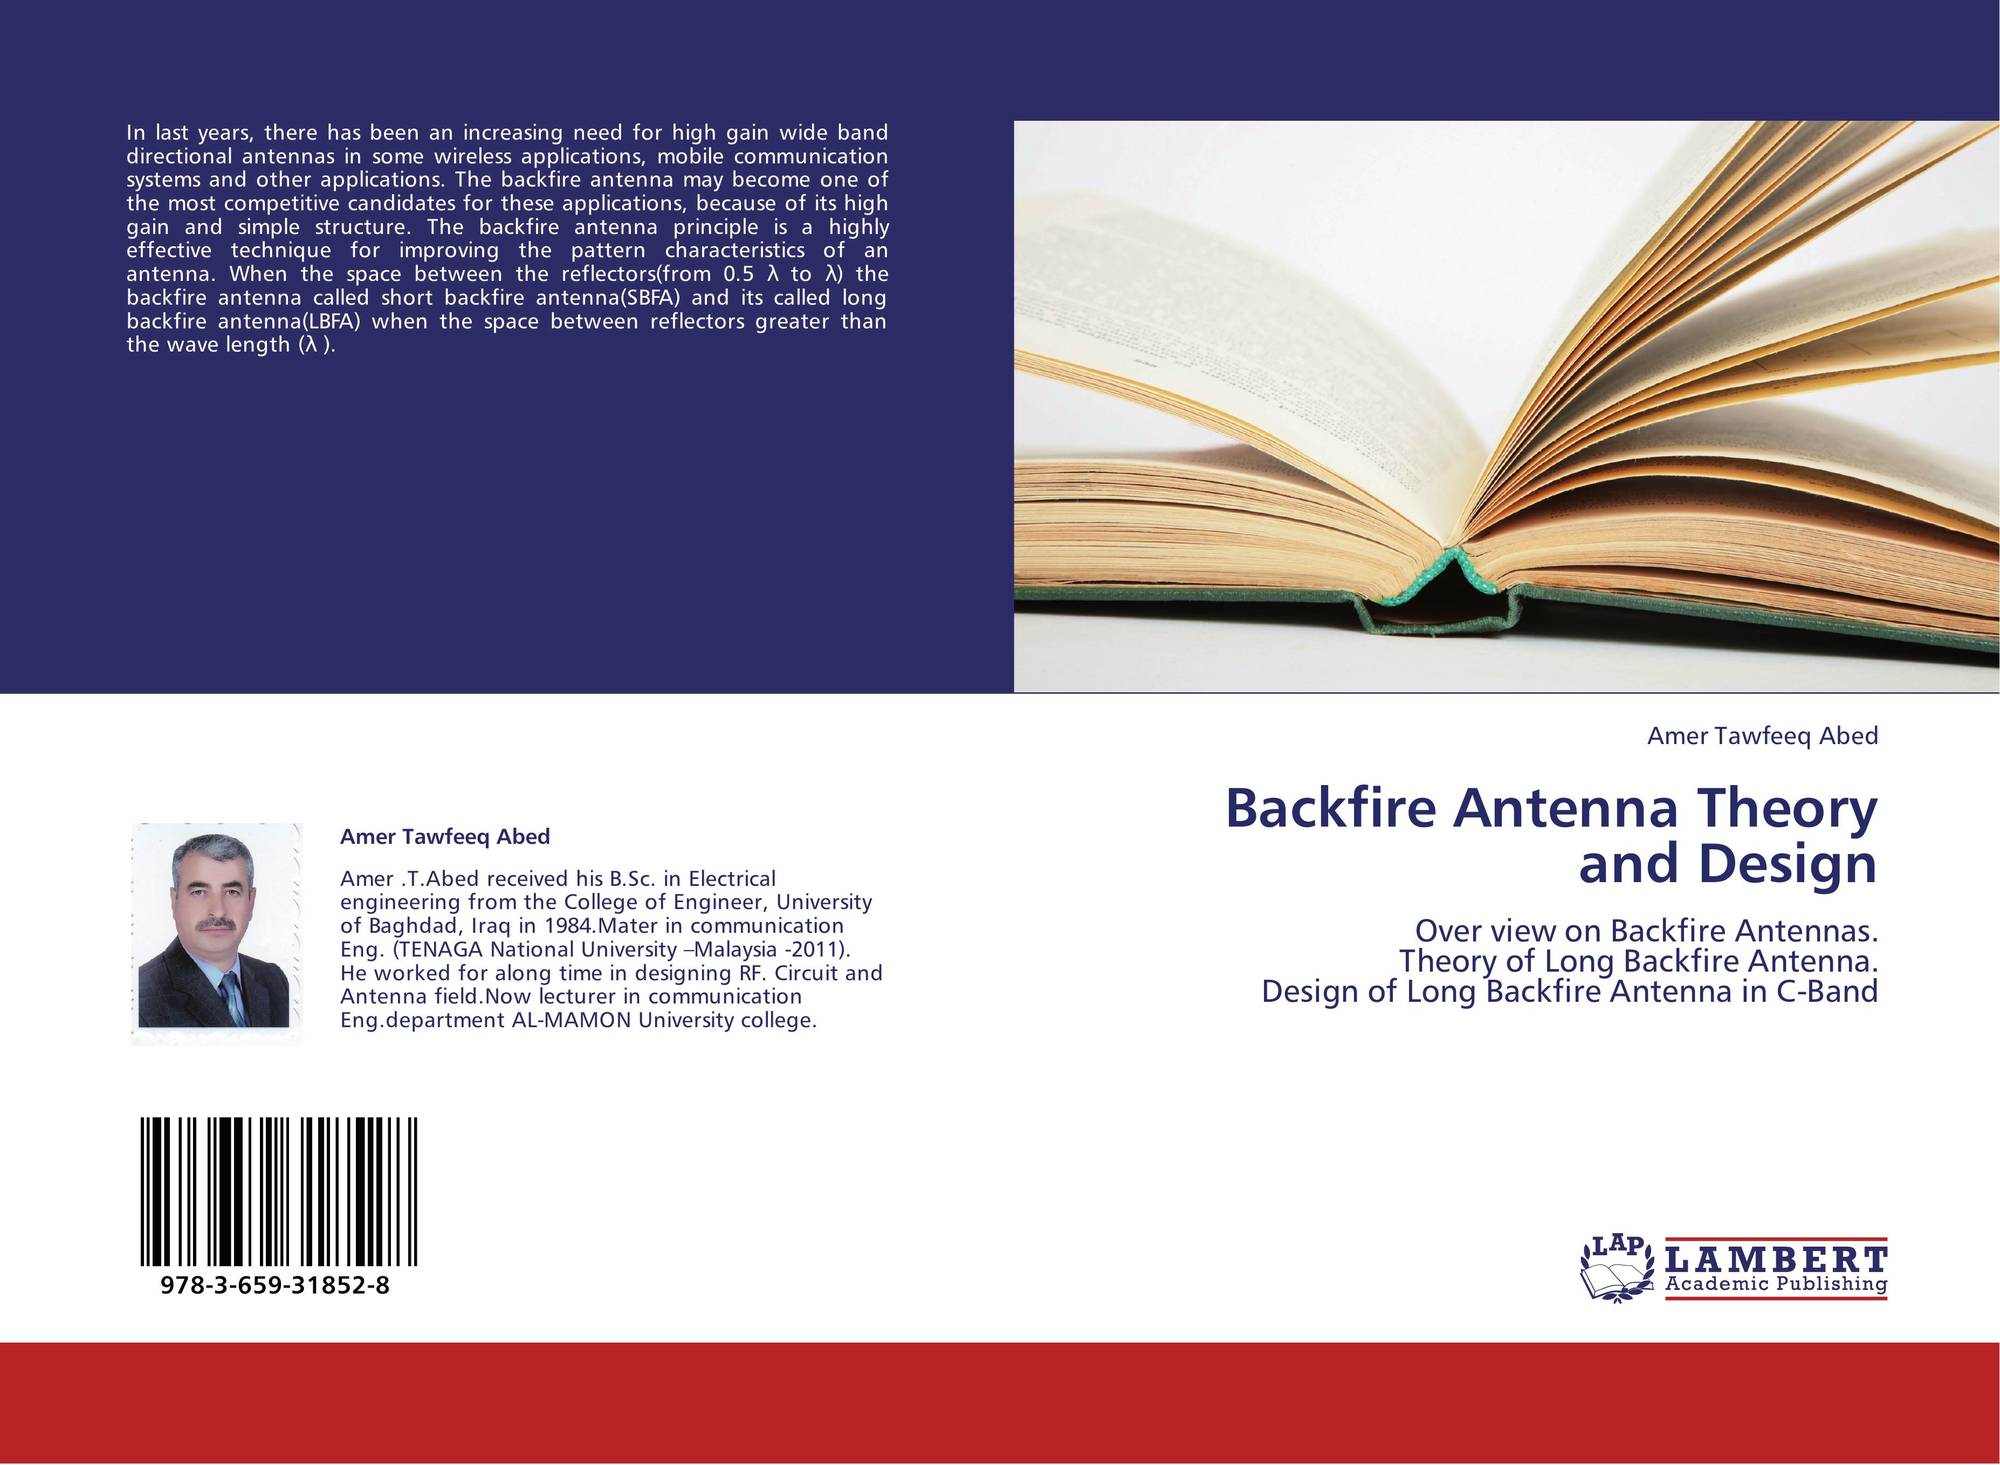 Backfire Antenna Theory and Design, 978-3-659-31852-8